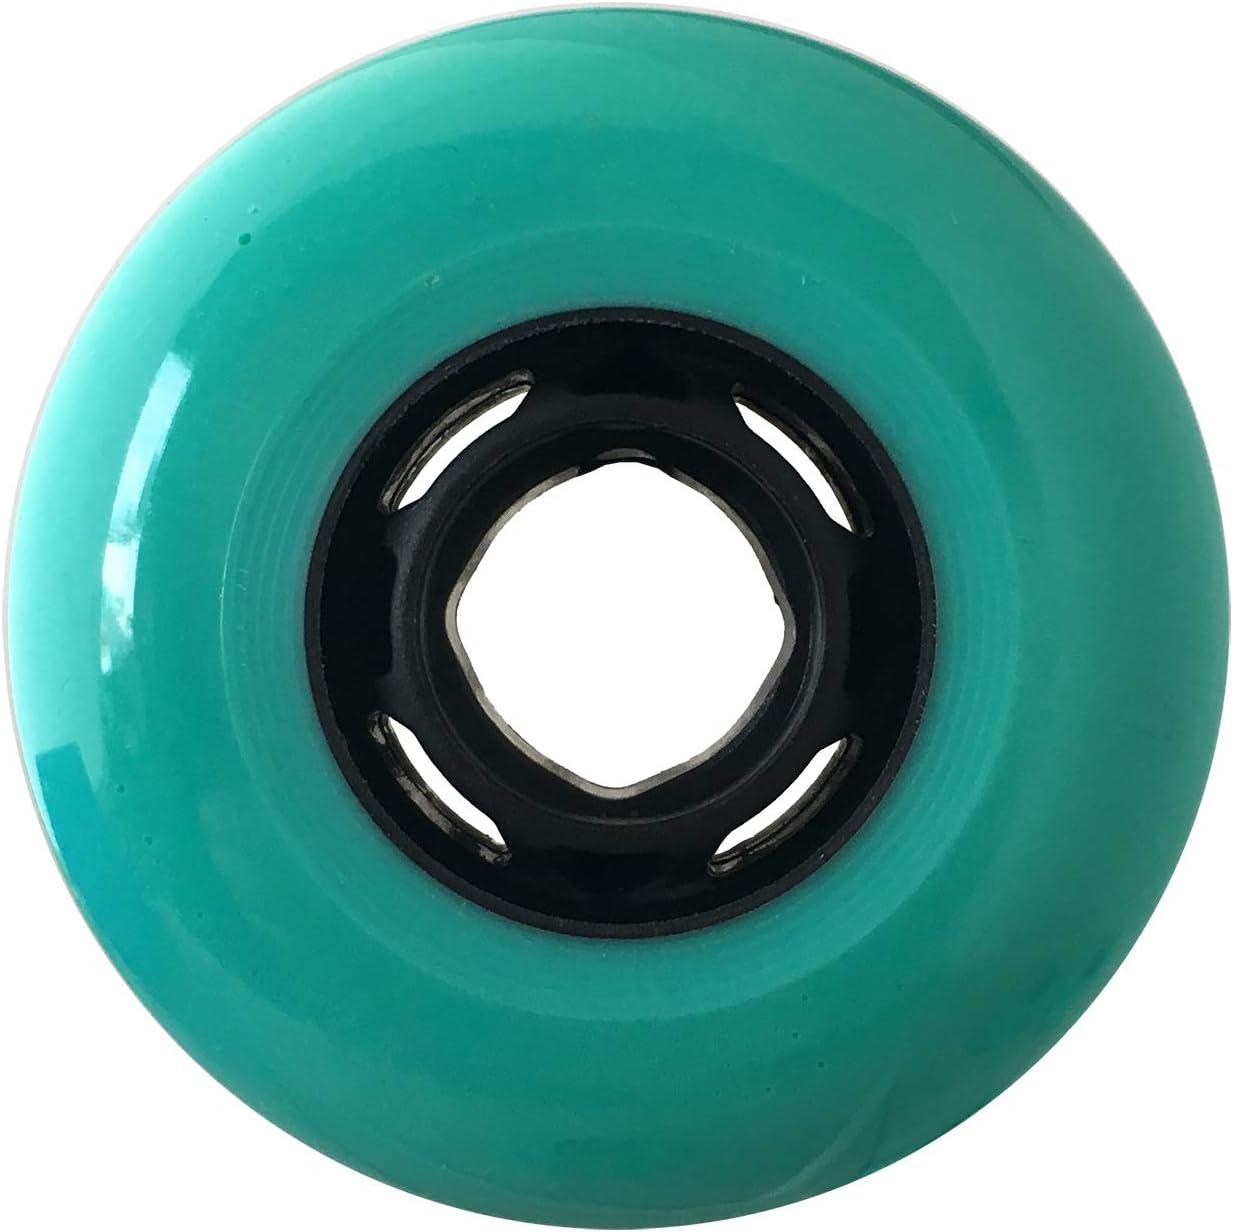 47mm 68mm 76mm /& 80mm Hi-Lo 72mm Revision Multi-Surface Pro Indoor//Outdoor Inline Roller Hockey Wheels 59mm